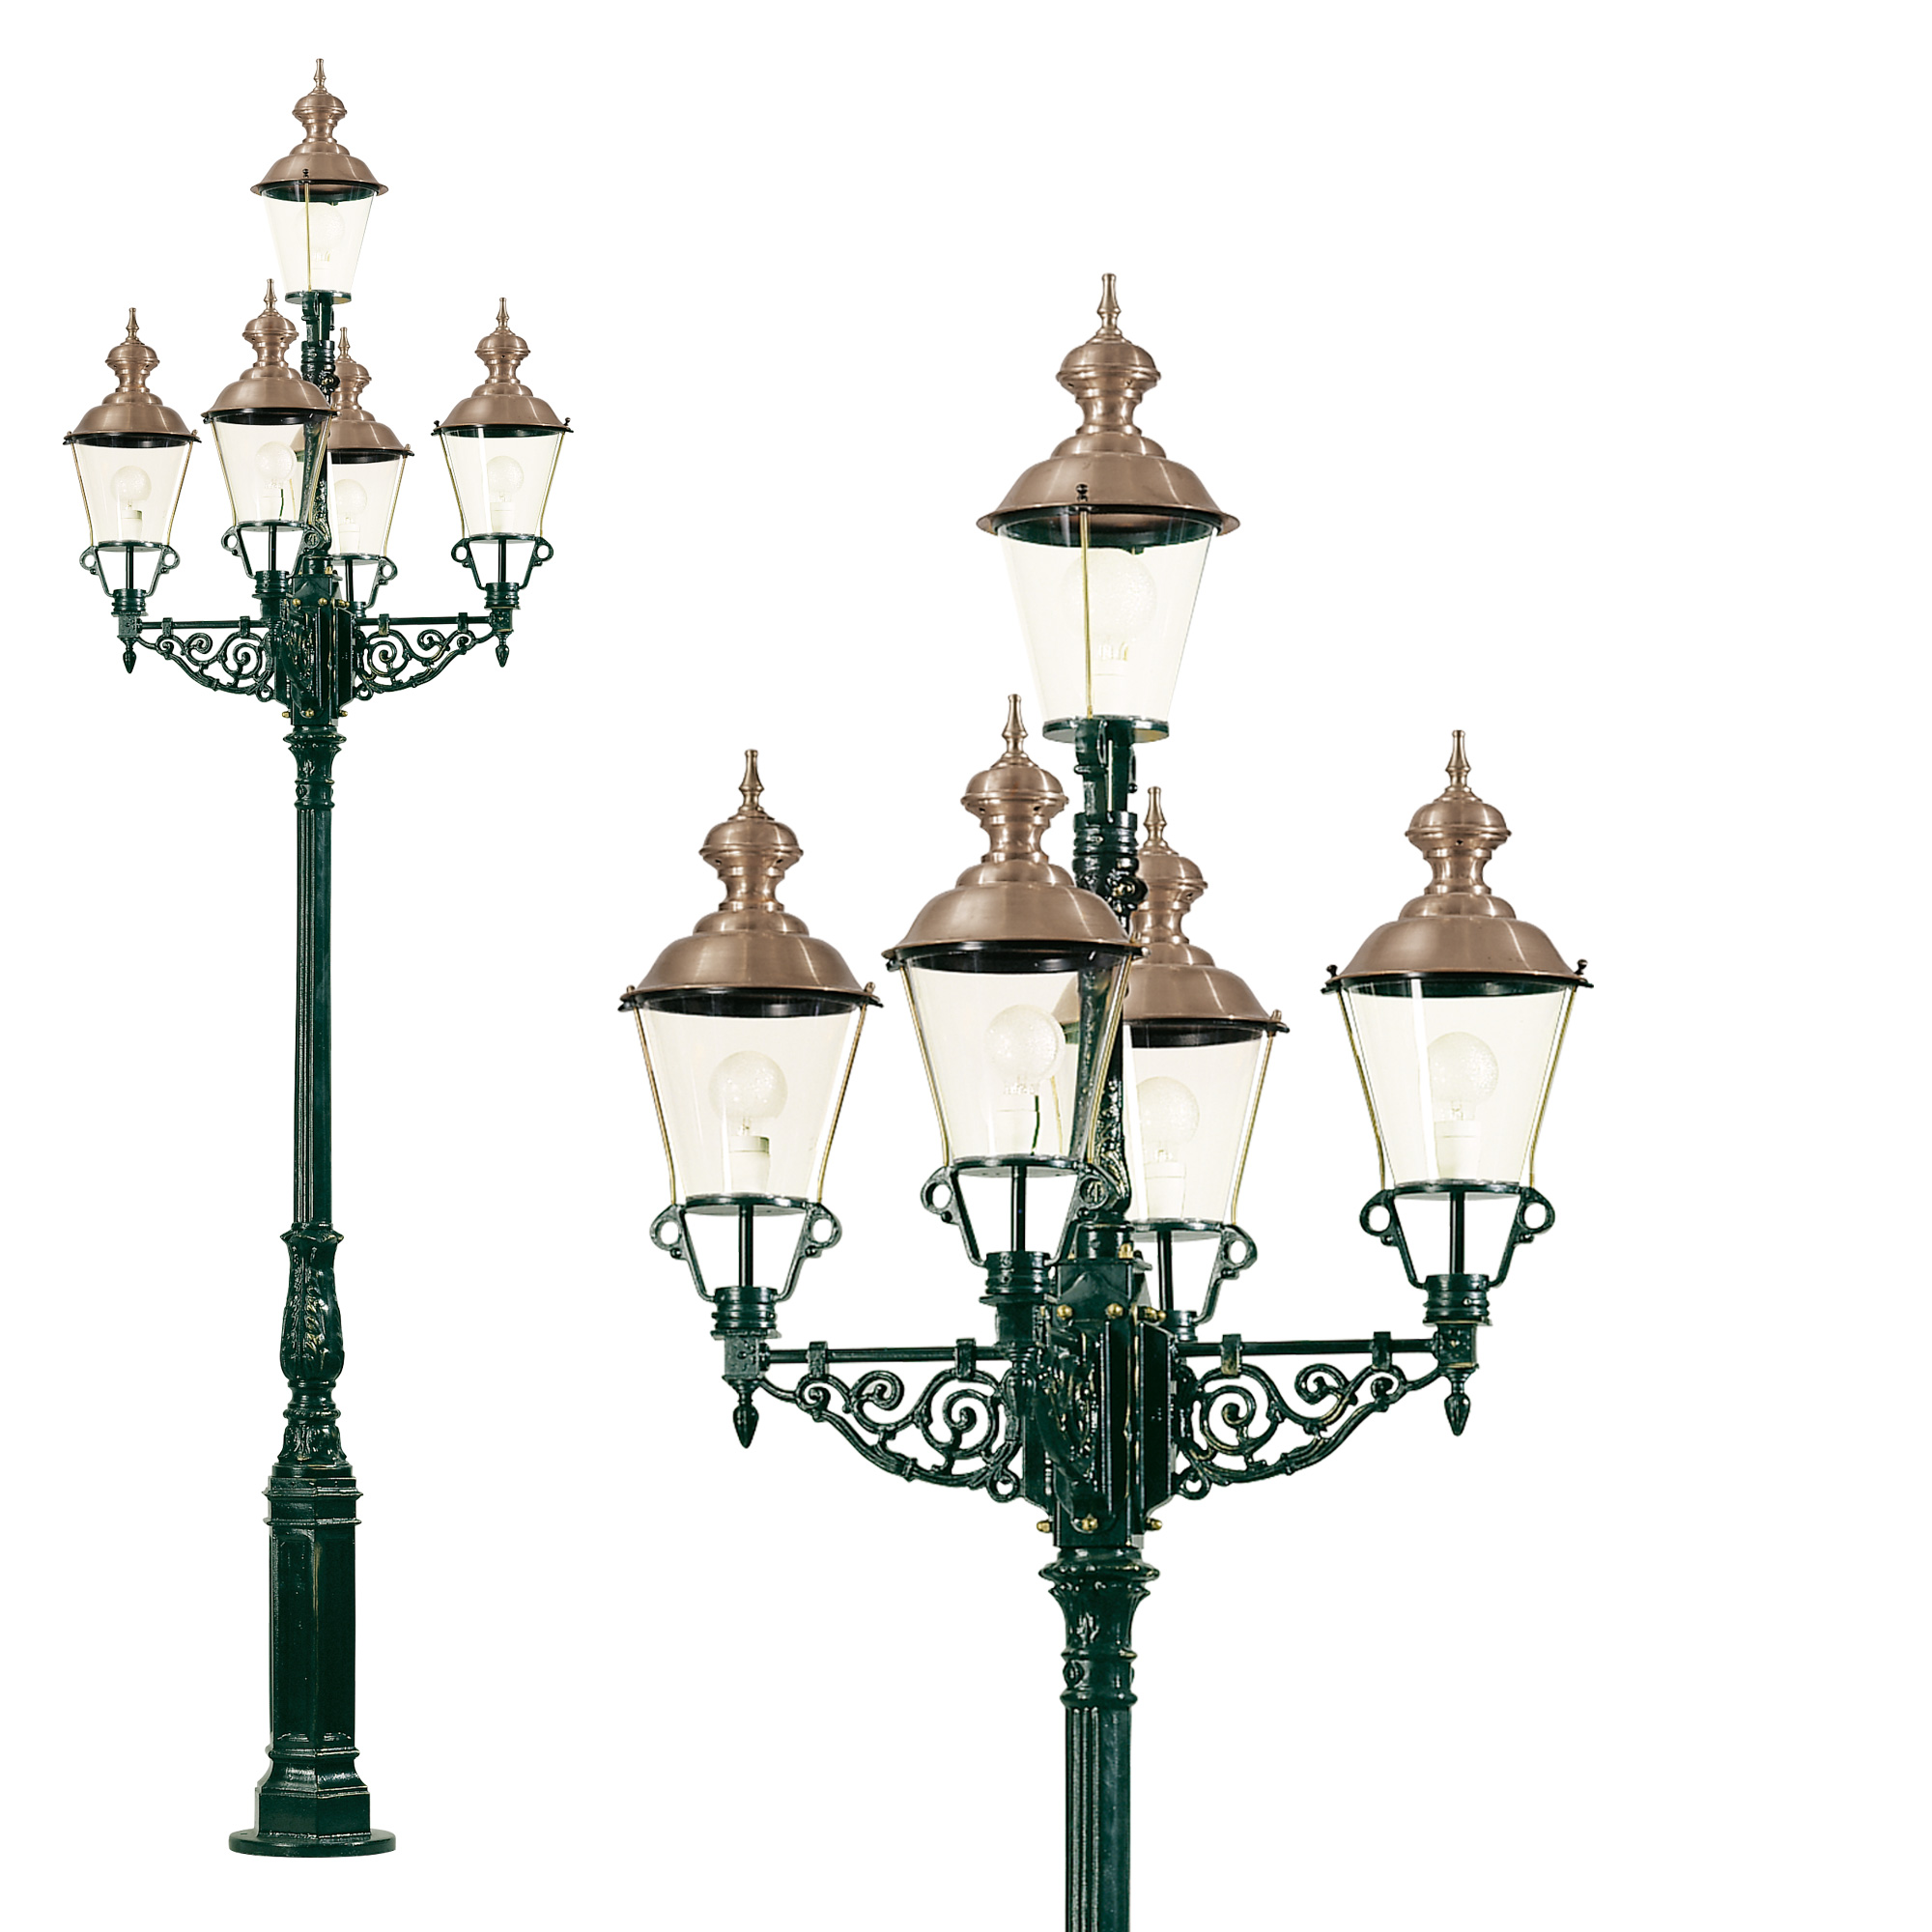 Monaco tuinlamp